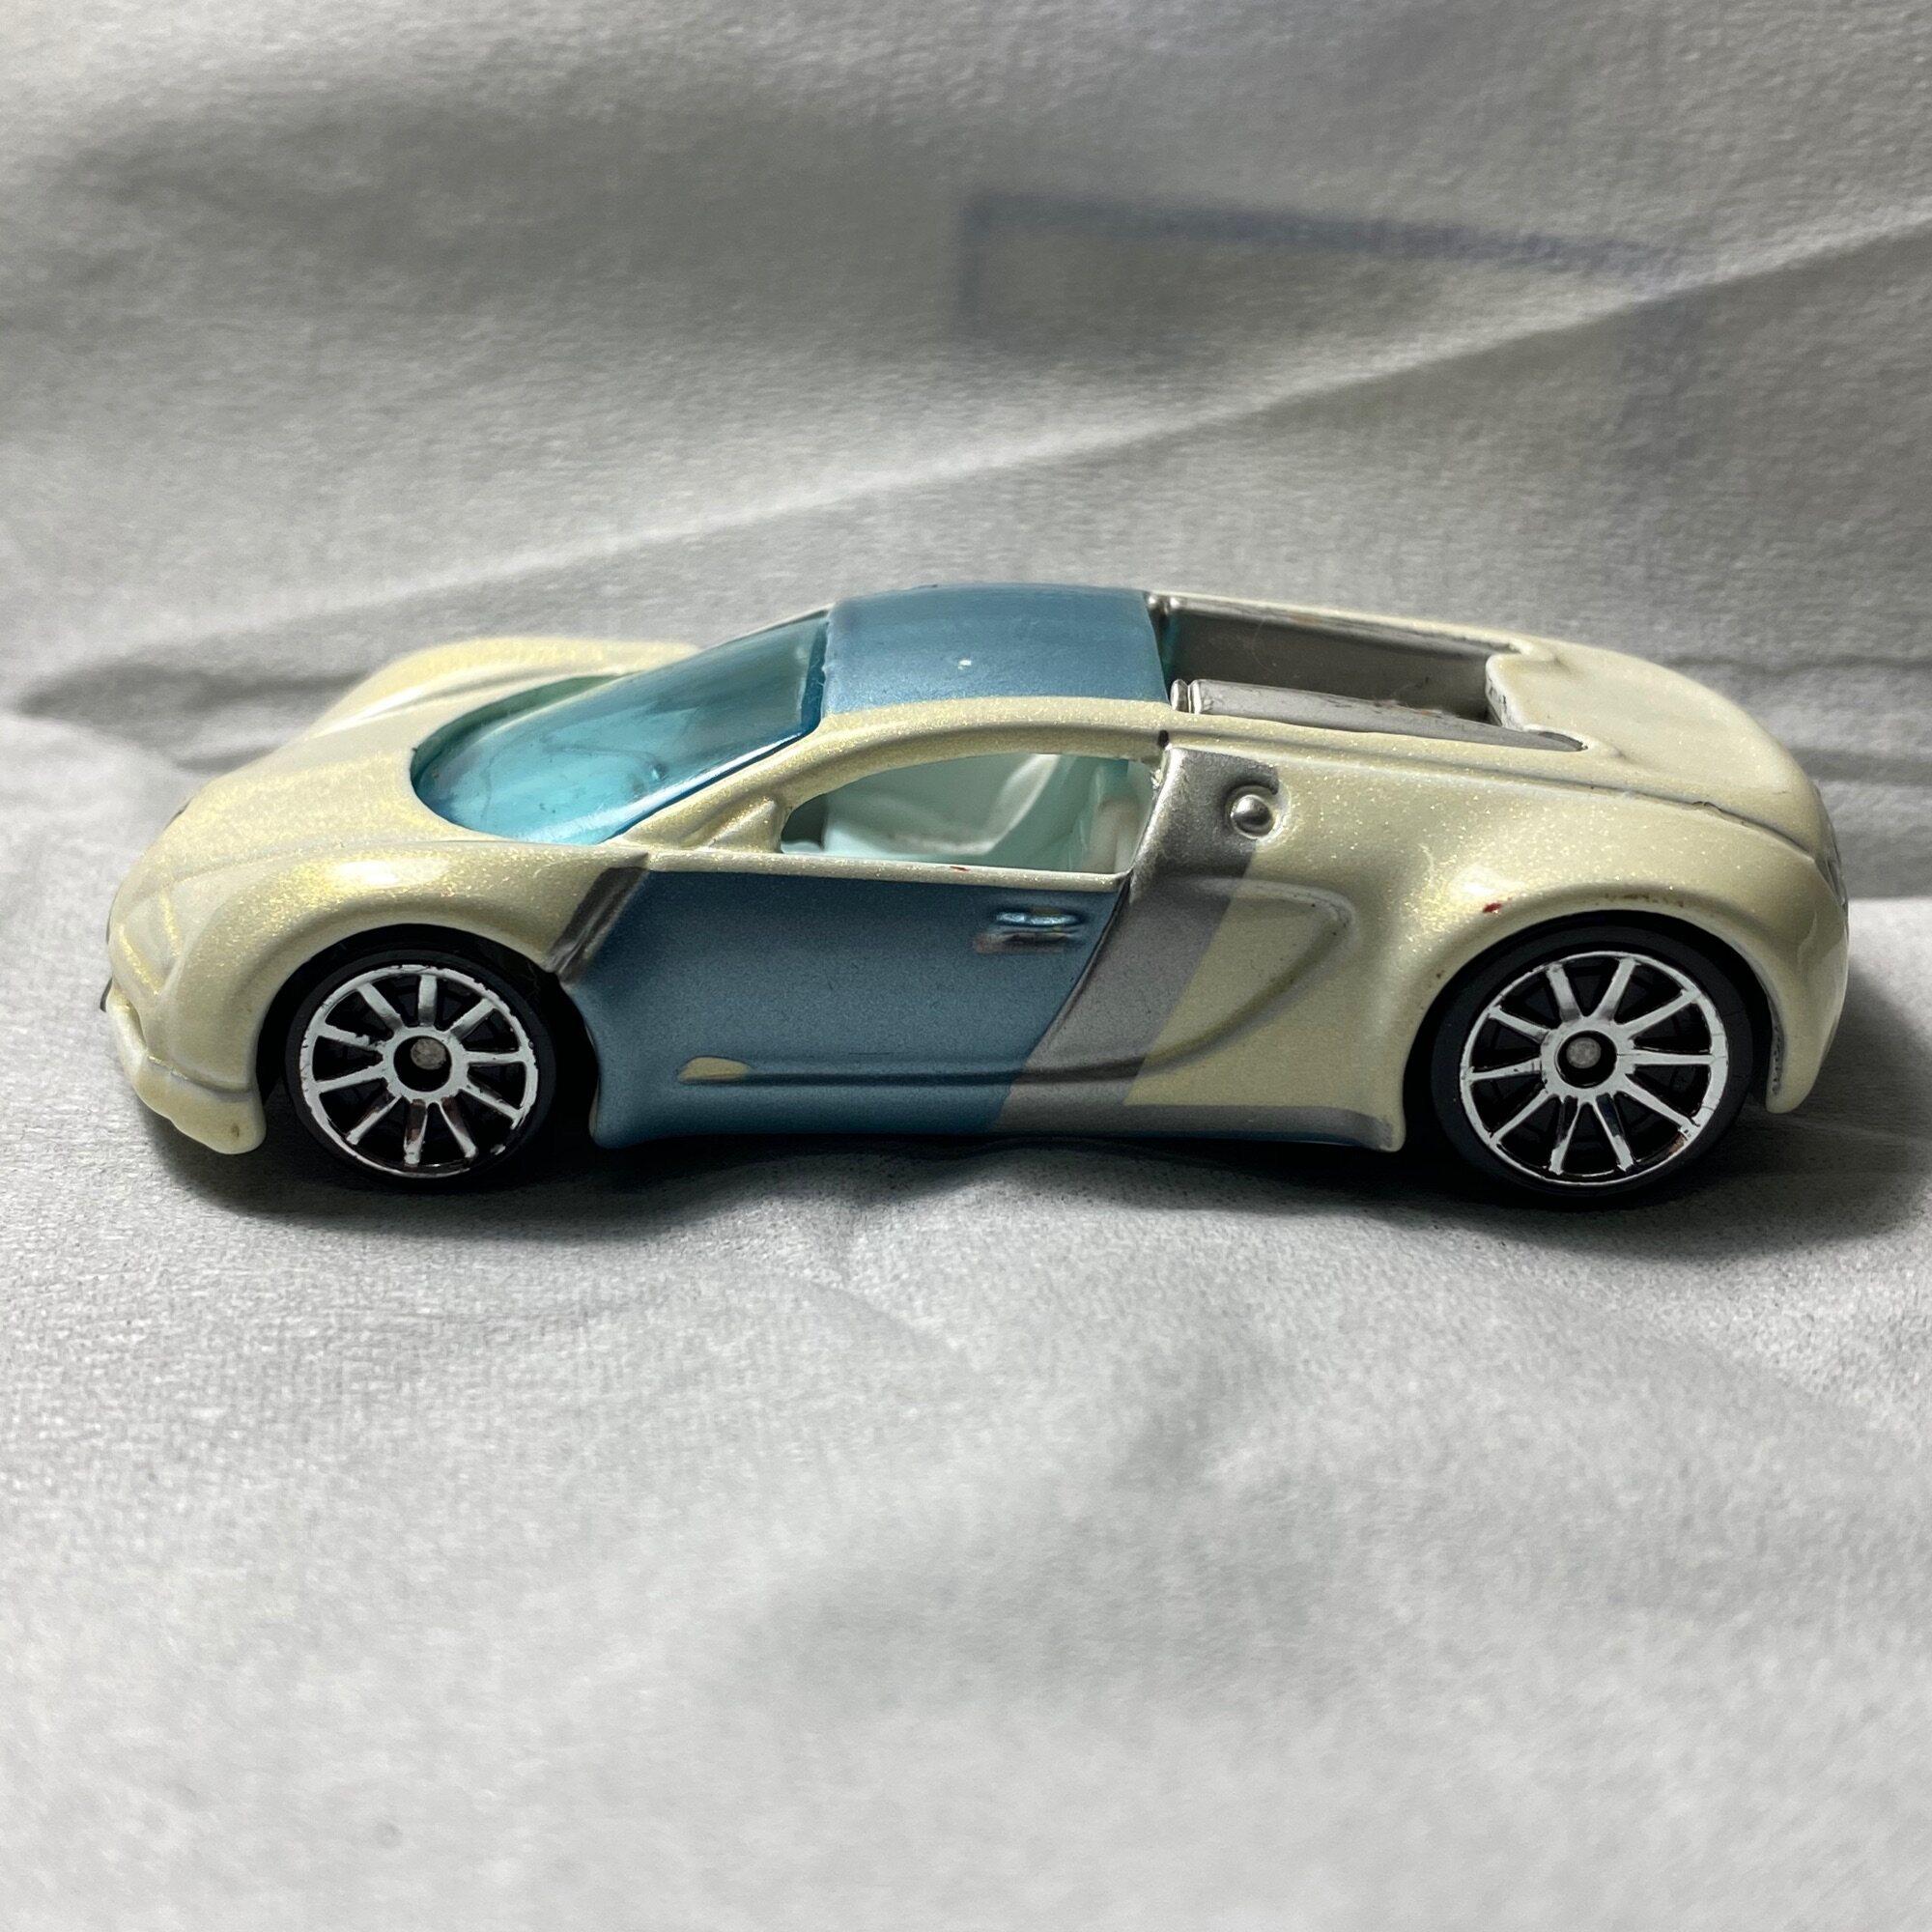 hotwheels bugatti veyron pearl white mystery car lazada hotwheels bugatti veyron pearl white mystery car